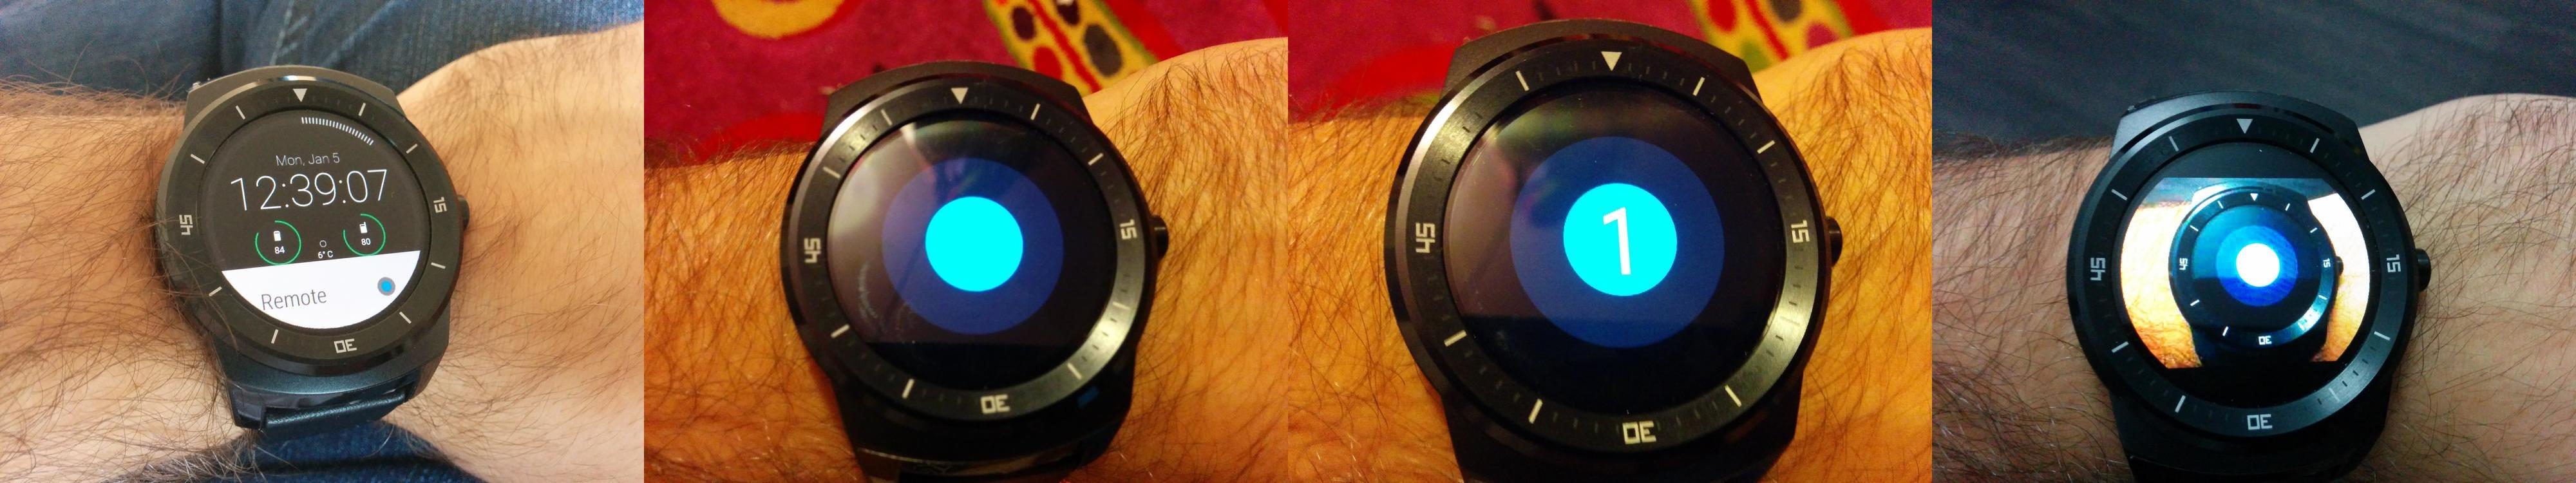 LG_G_watch_R_foto_aparat